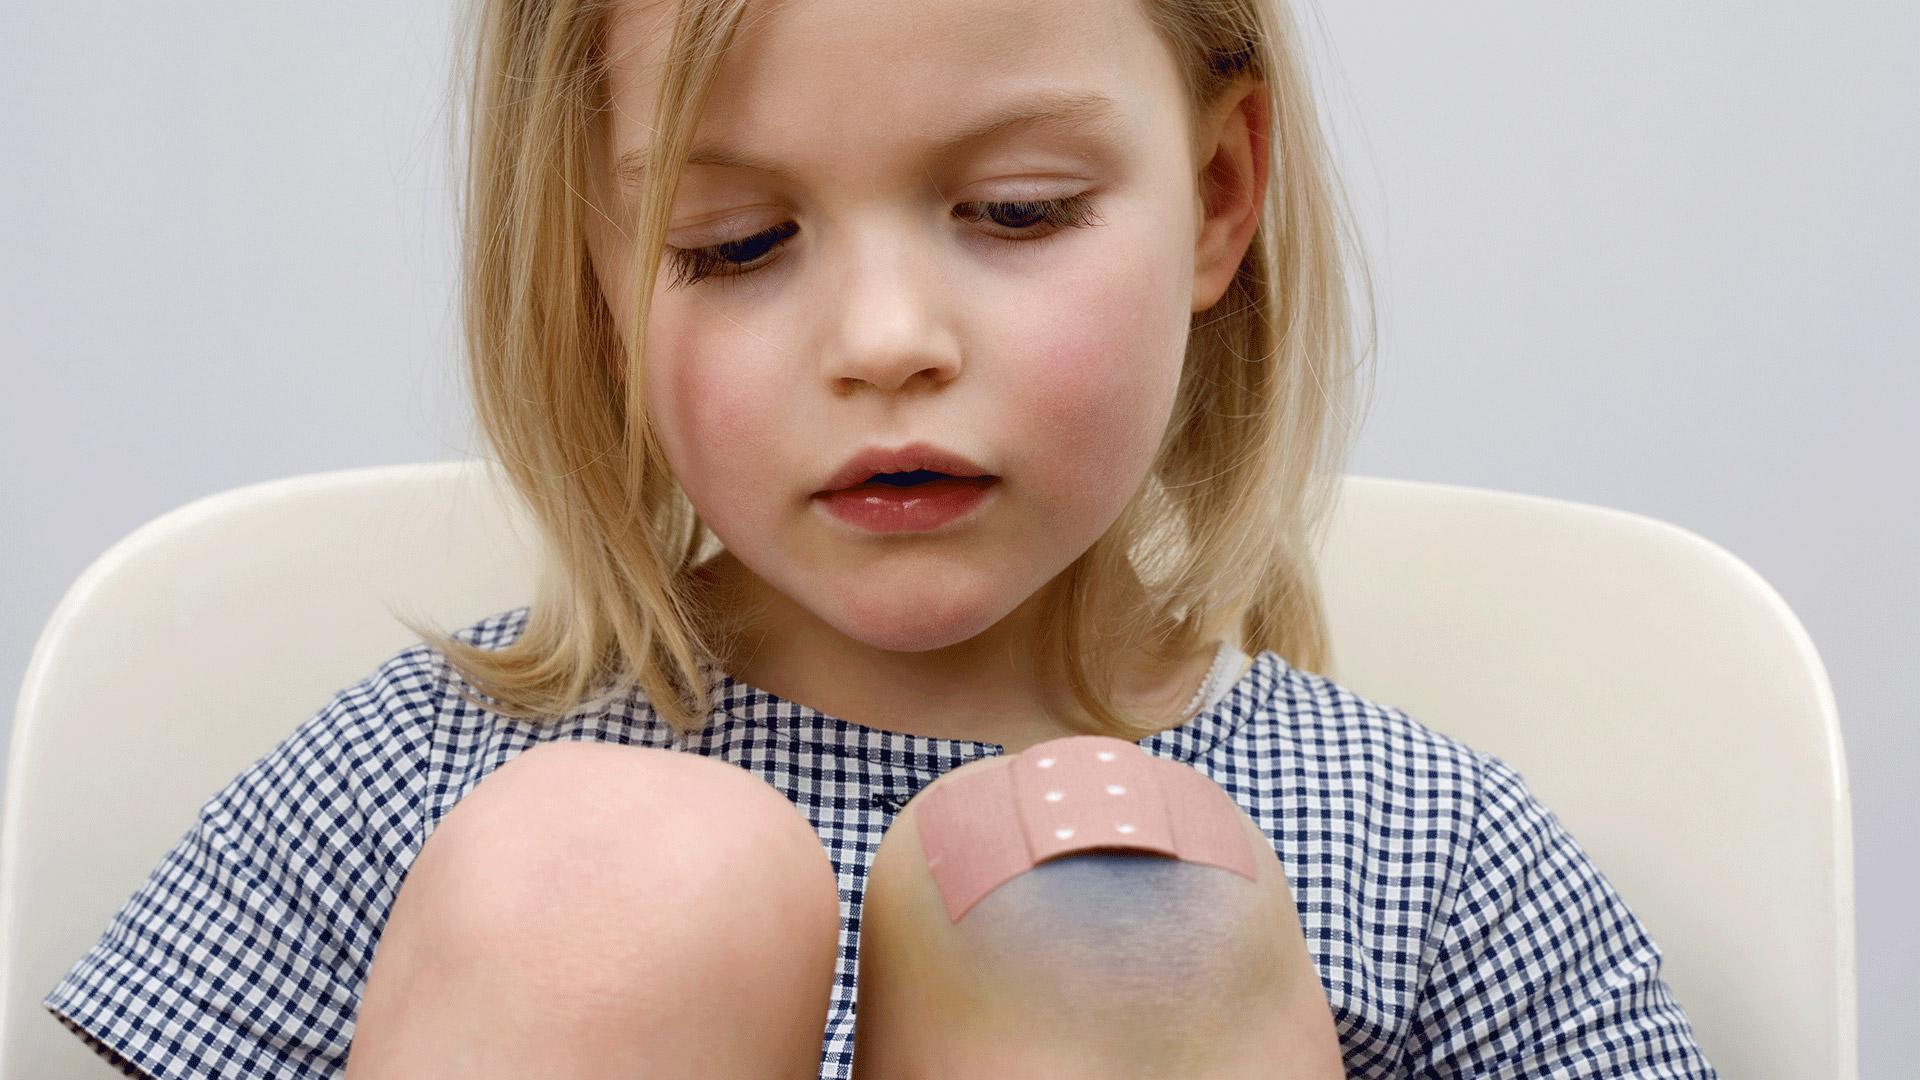 manchas de golpes en la piel